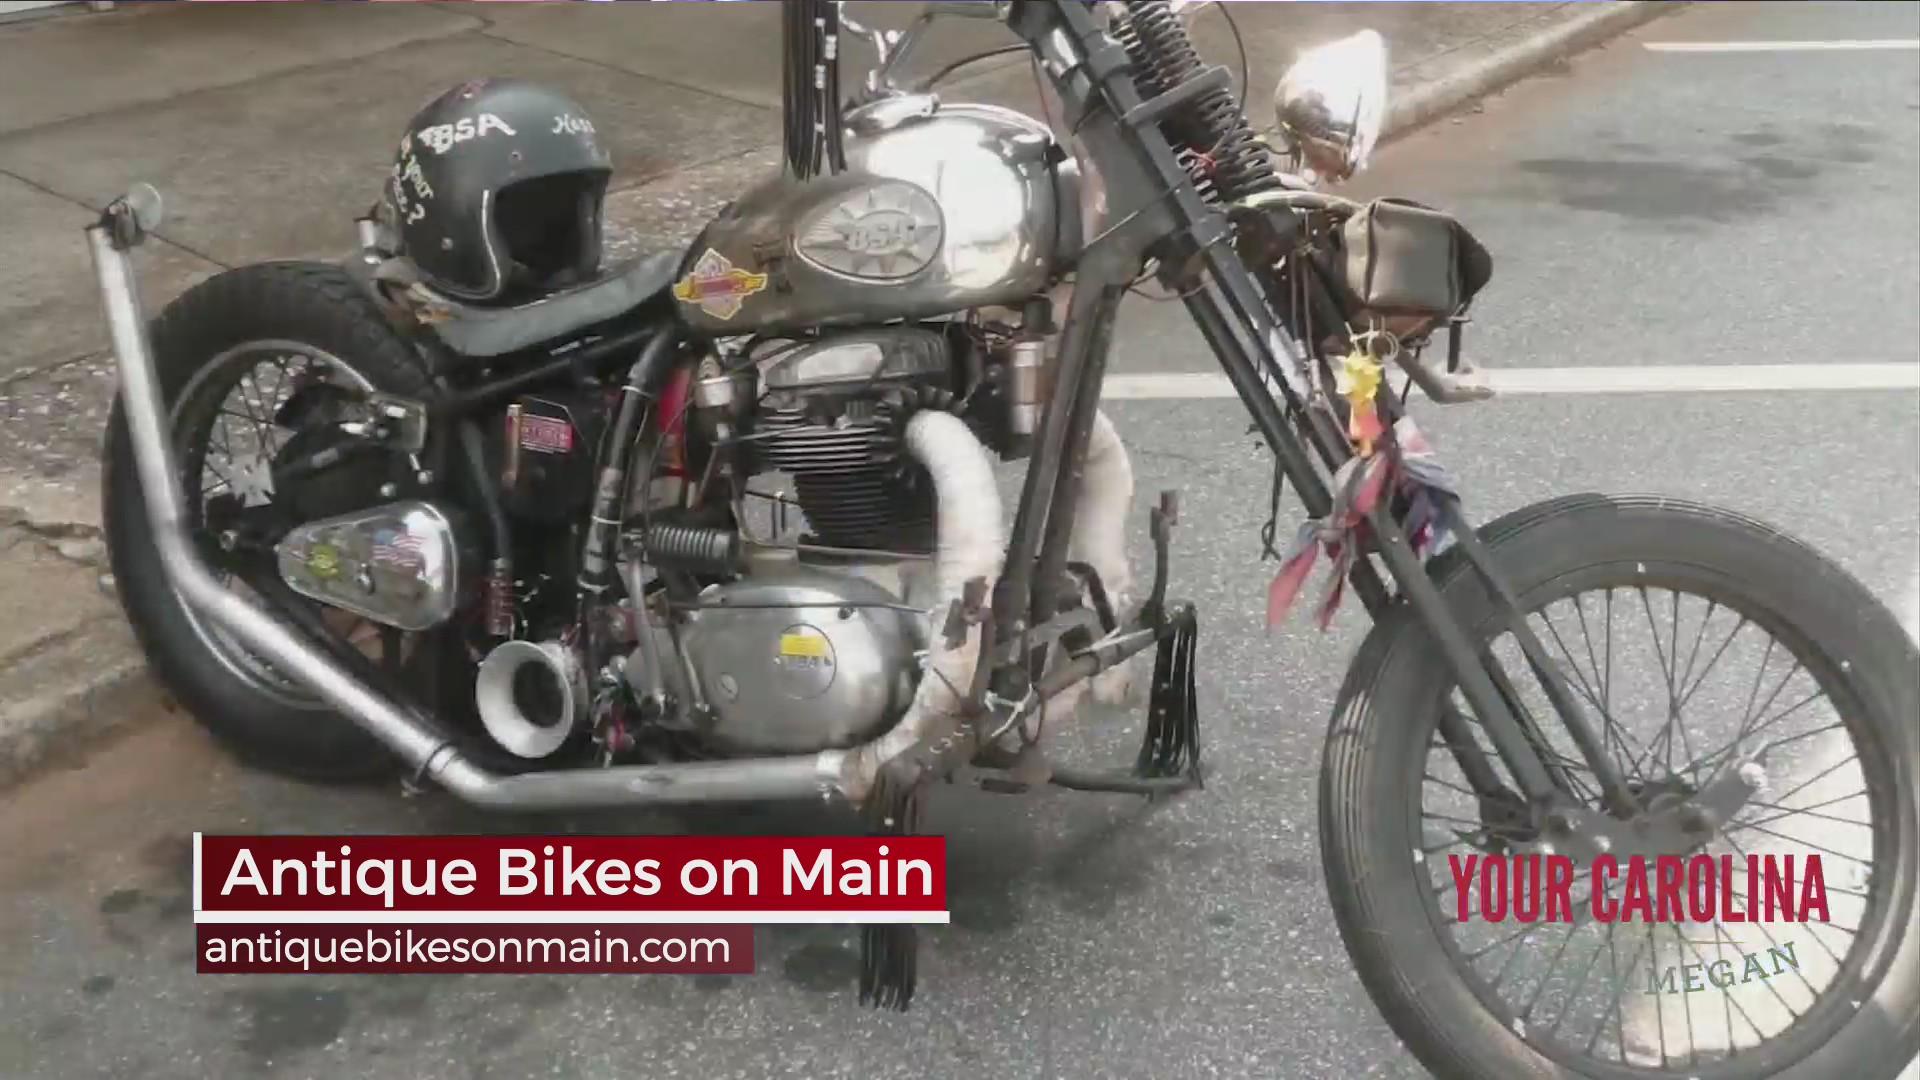 Antique Bikes on Main